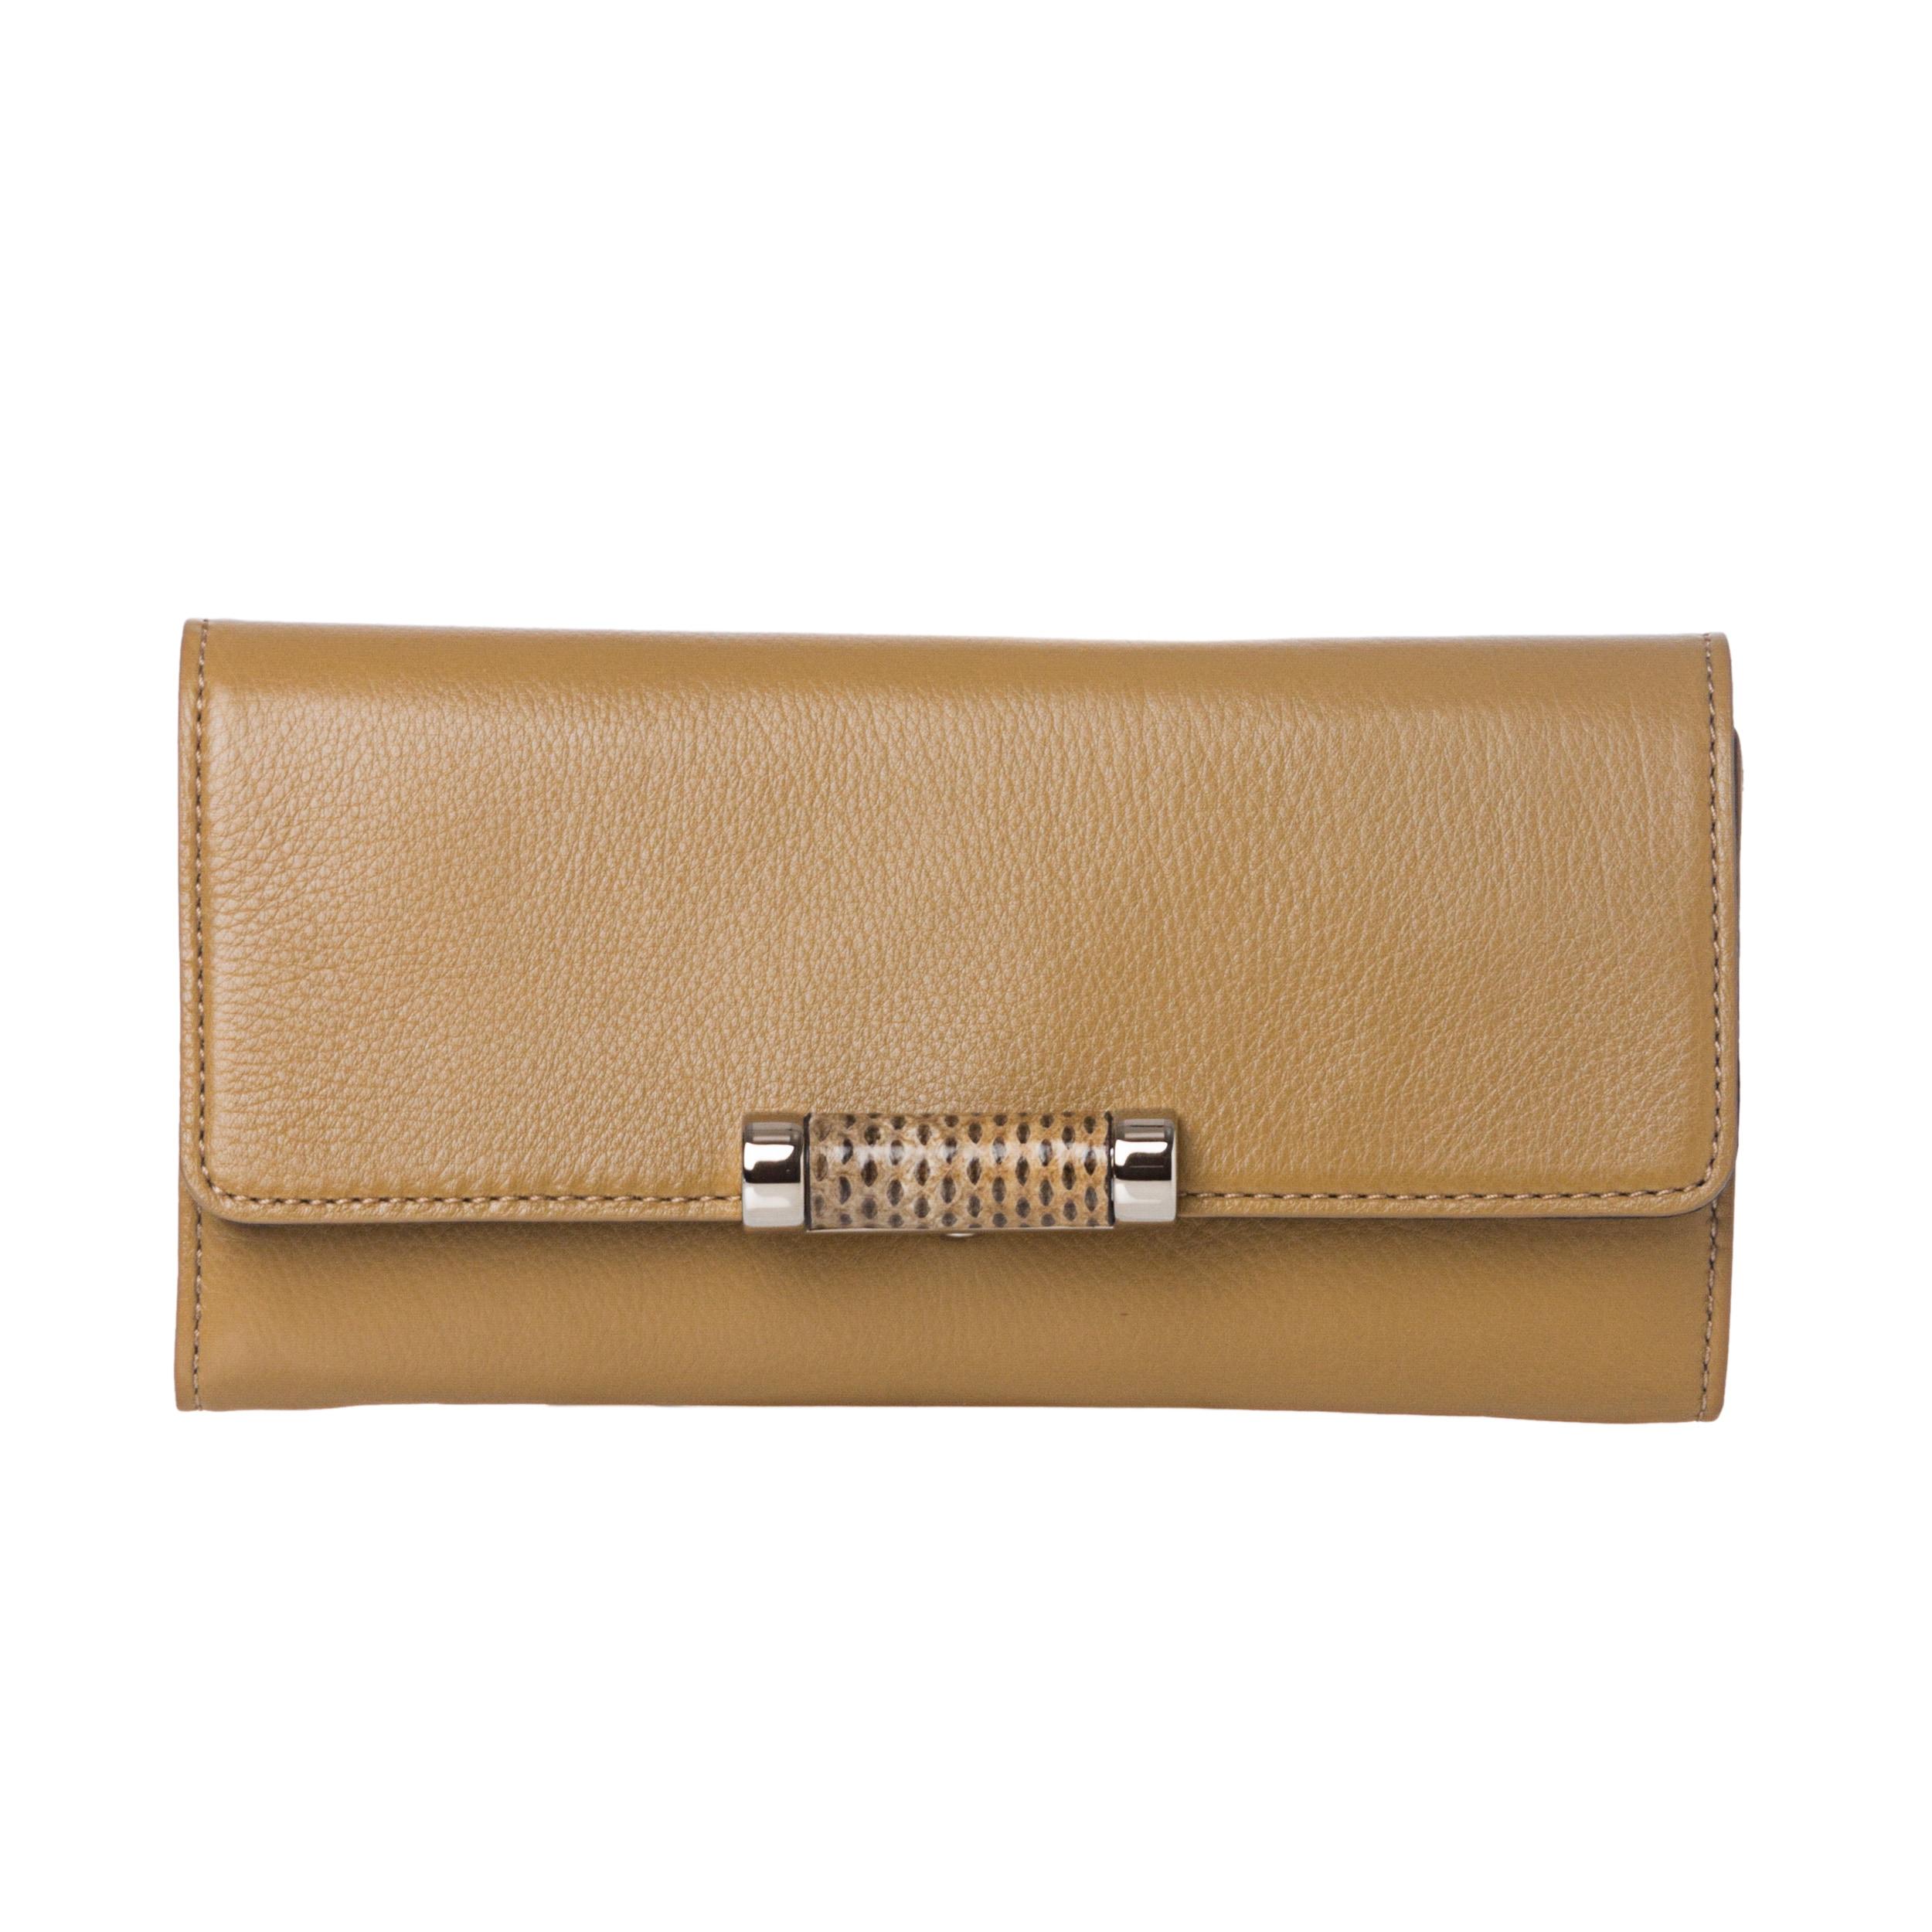 Michael Kors 'Tonne' Beige Leather Continental Wallet